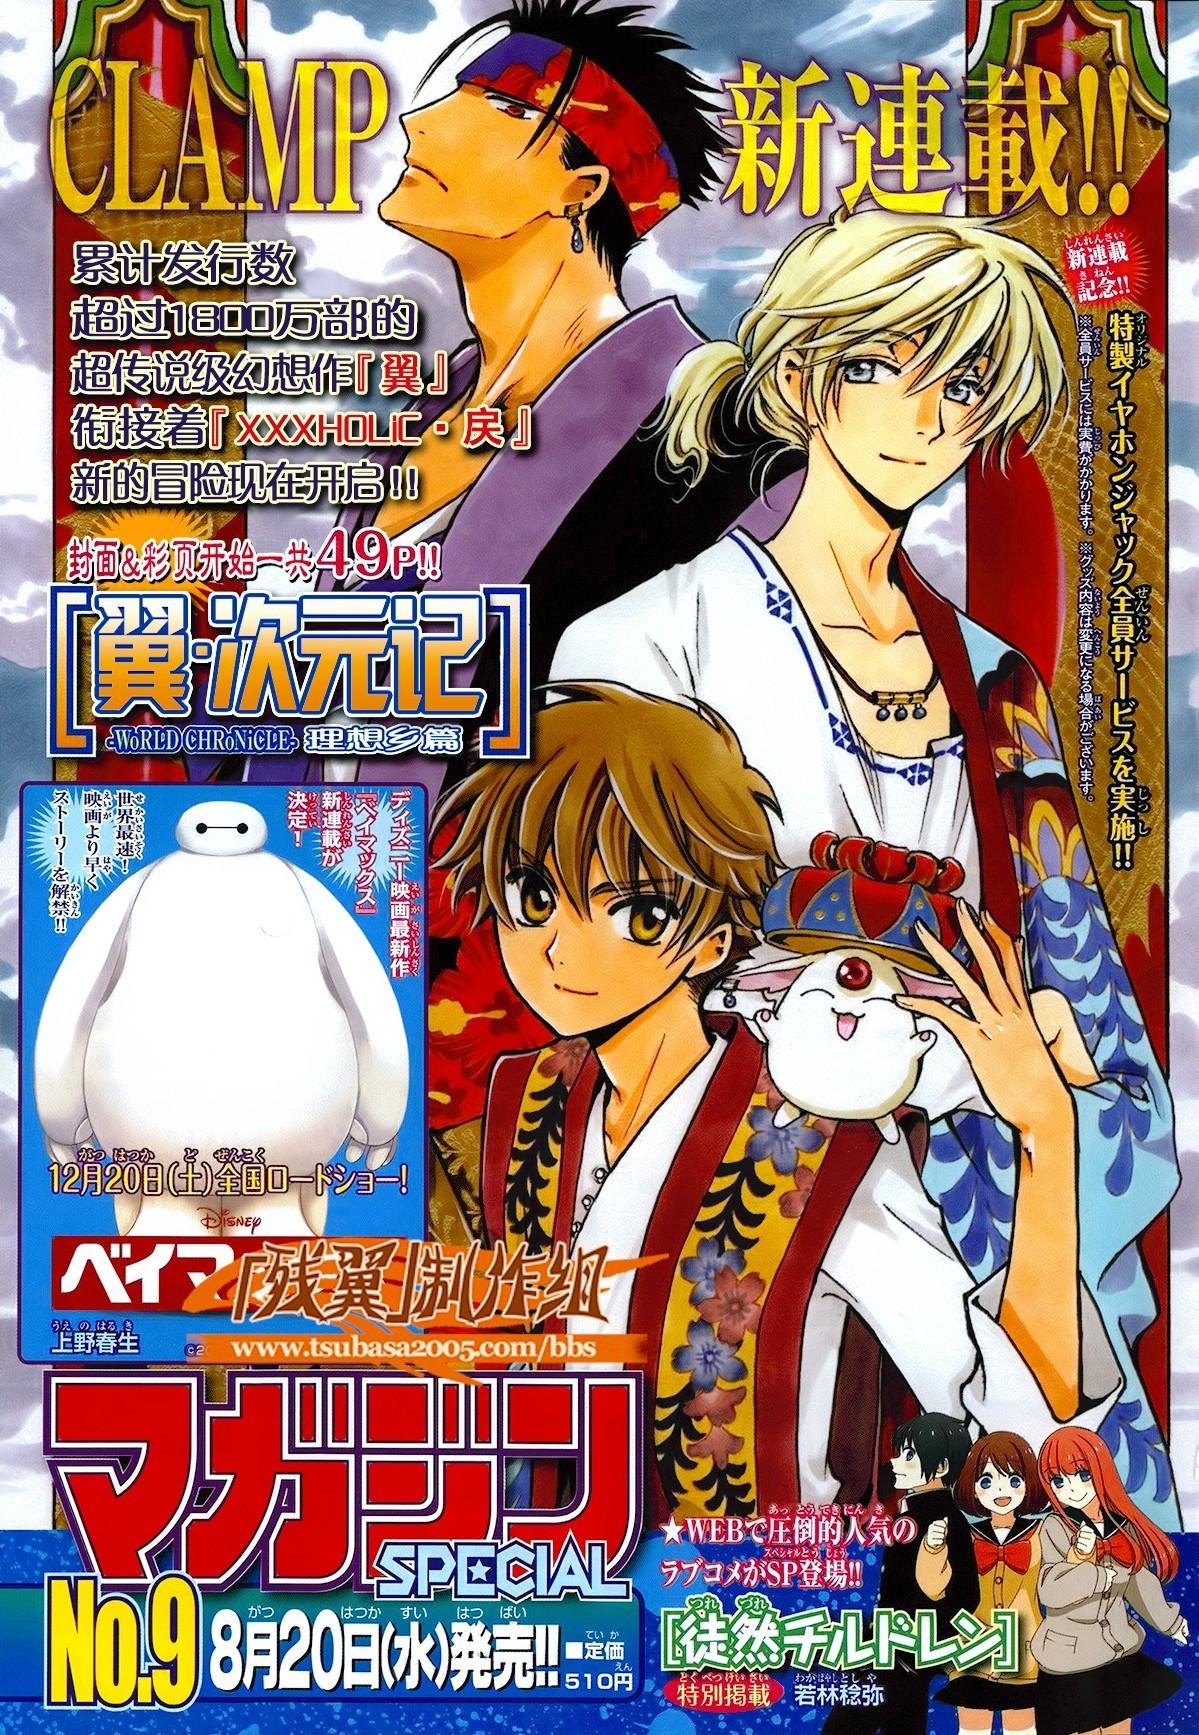 Le retour en 2014: Tsubasa ~WoRLD CHRoNiCLE~ Nirai Kanai-hen  - Page 2 Tumblr_n91es8BAx91sfn0mso1_1280